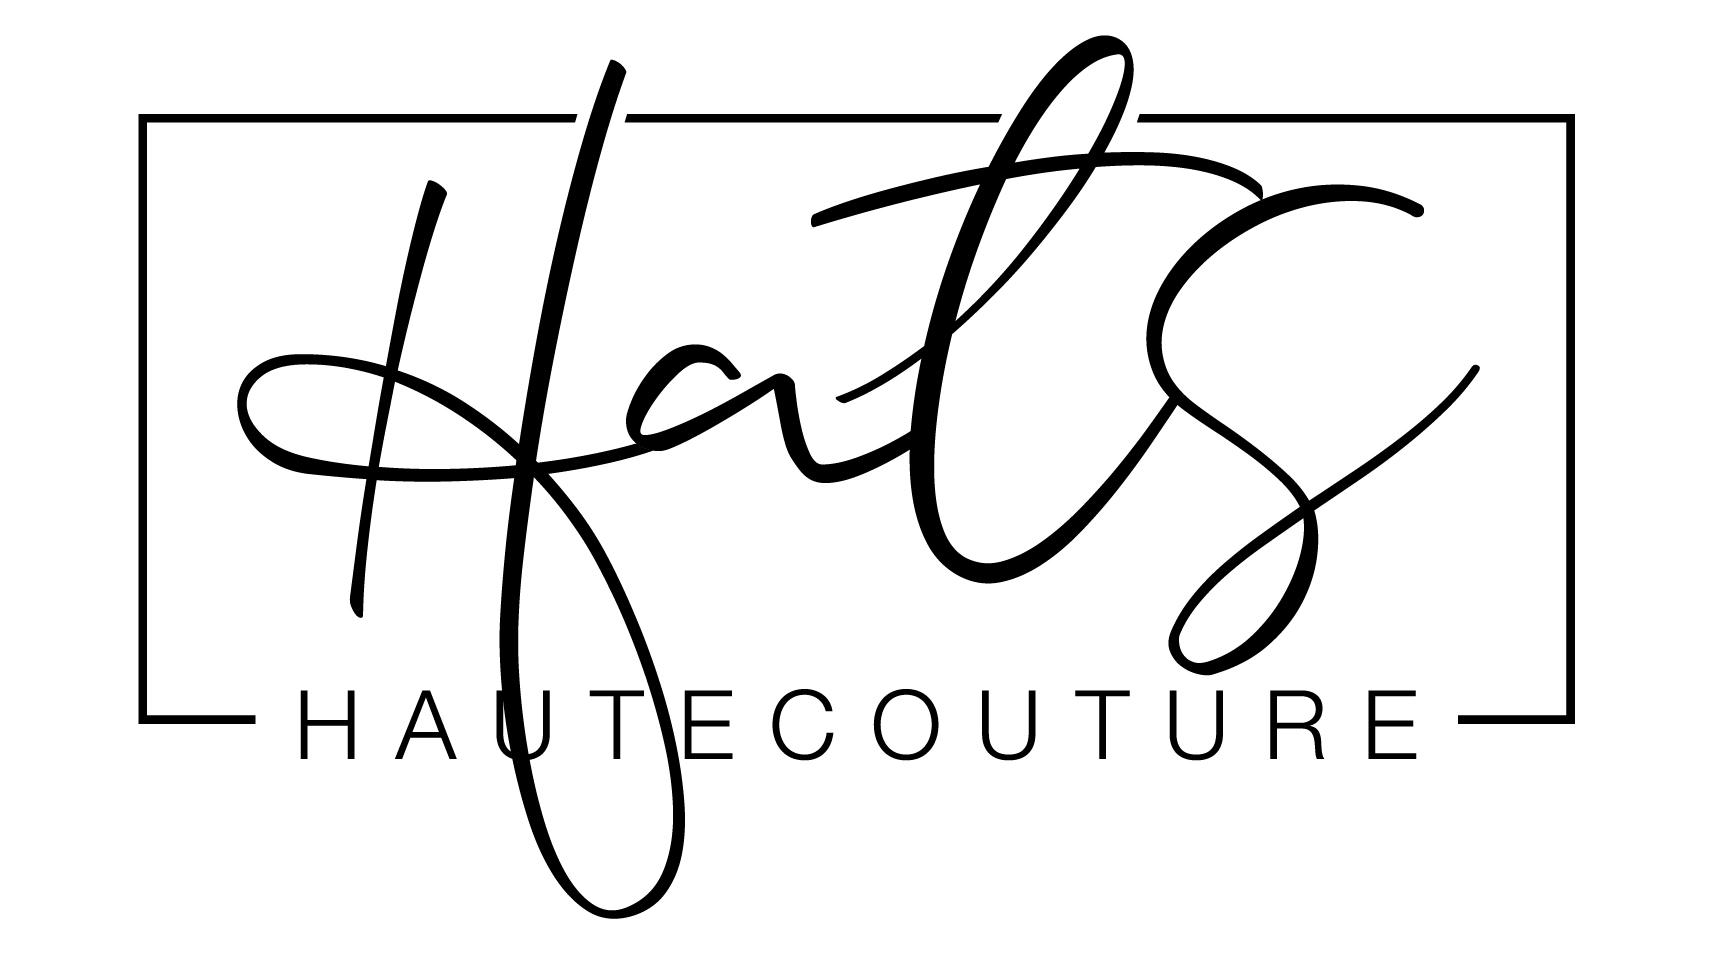 Hatshautecouture